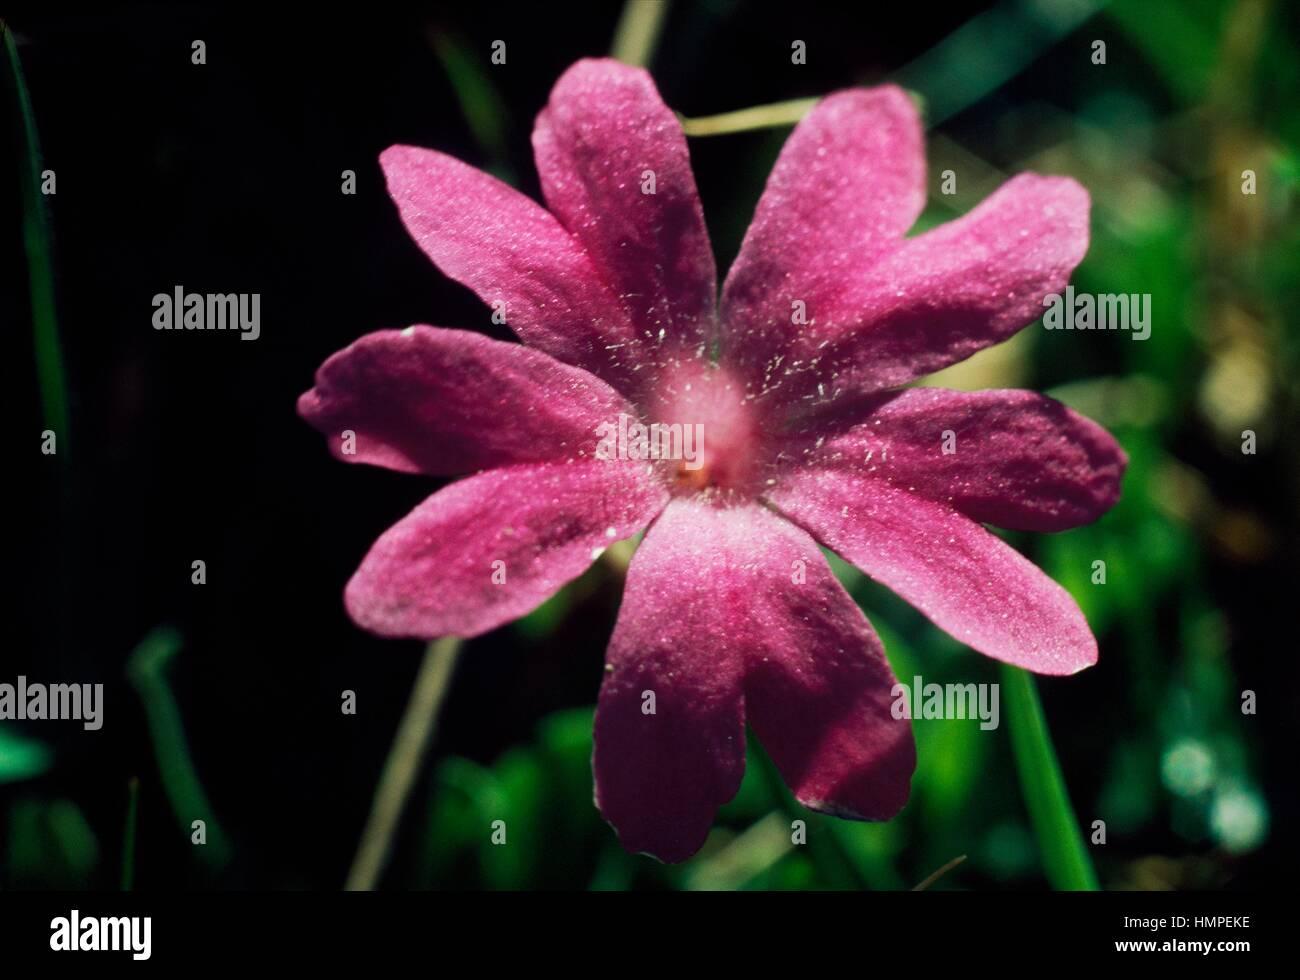 Entire leaved primrose (Primula integrifolia), Primulaceae. - Stock Image